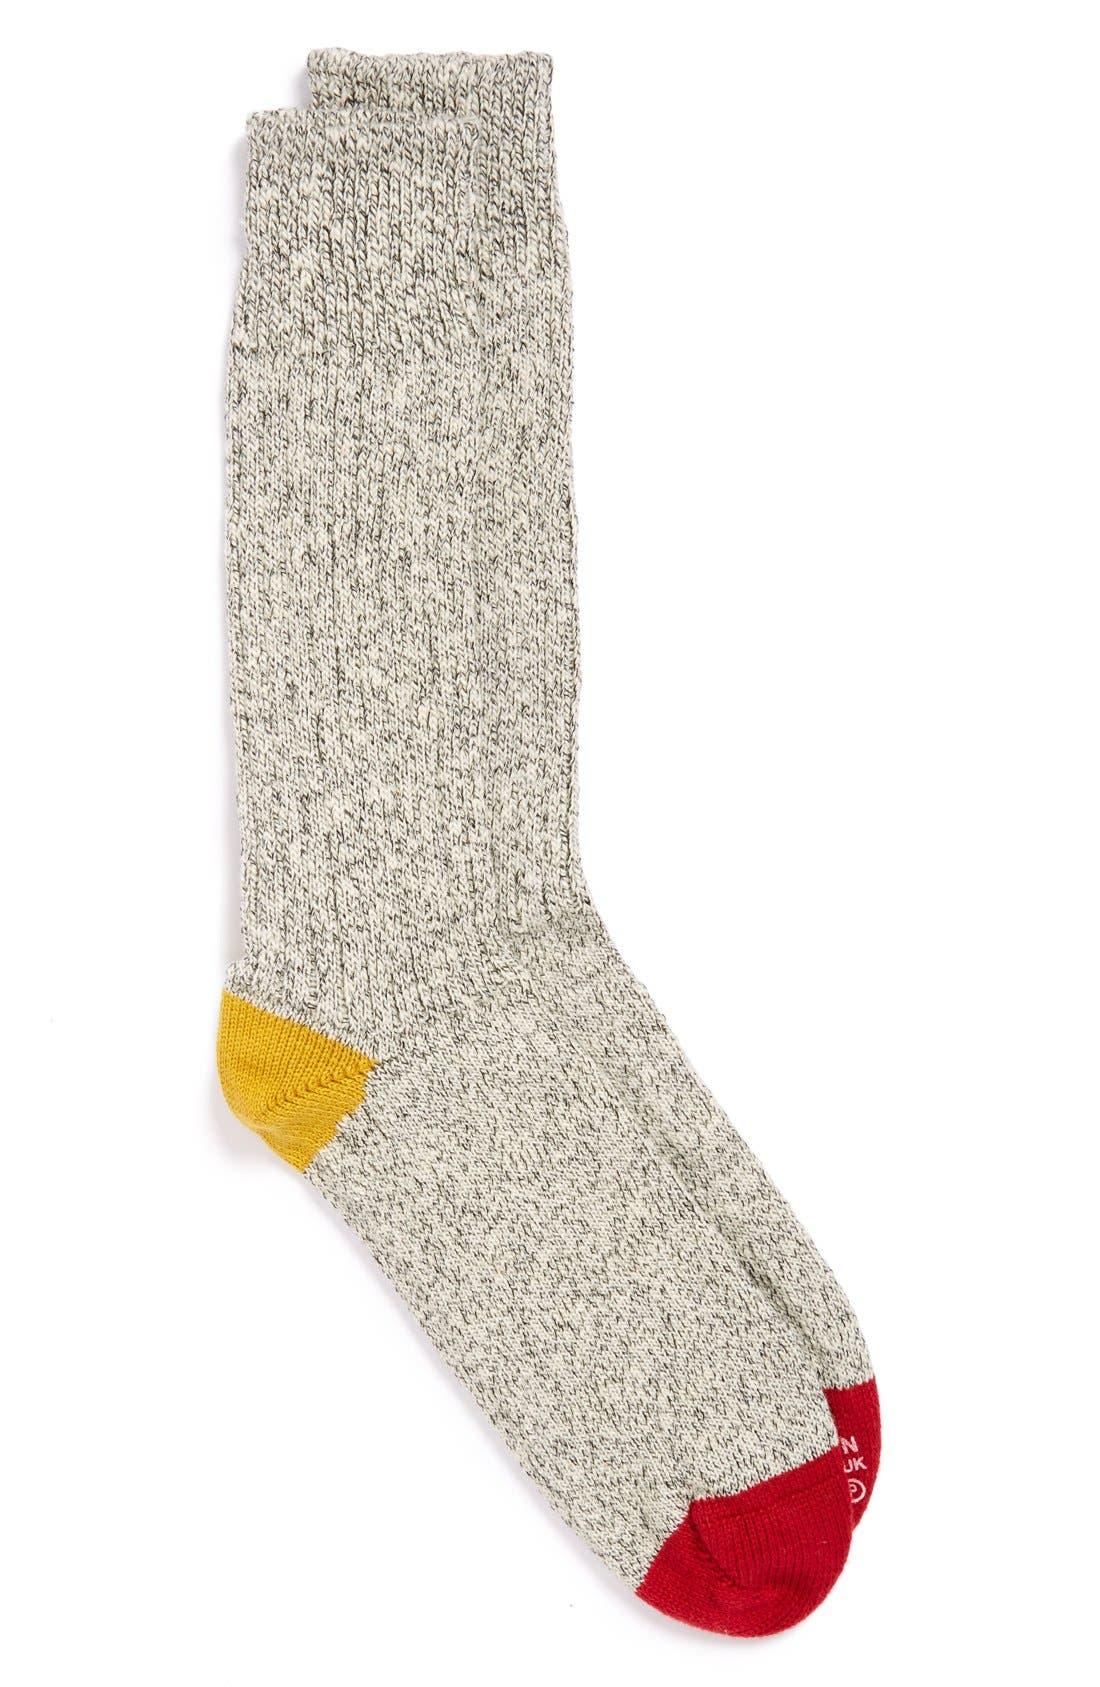 Knit Cotton Socks, Main, color, 700